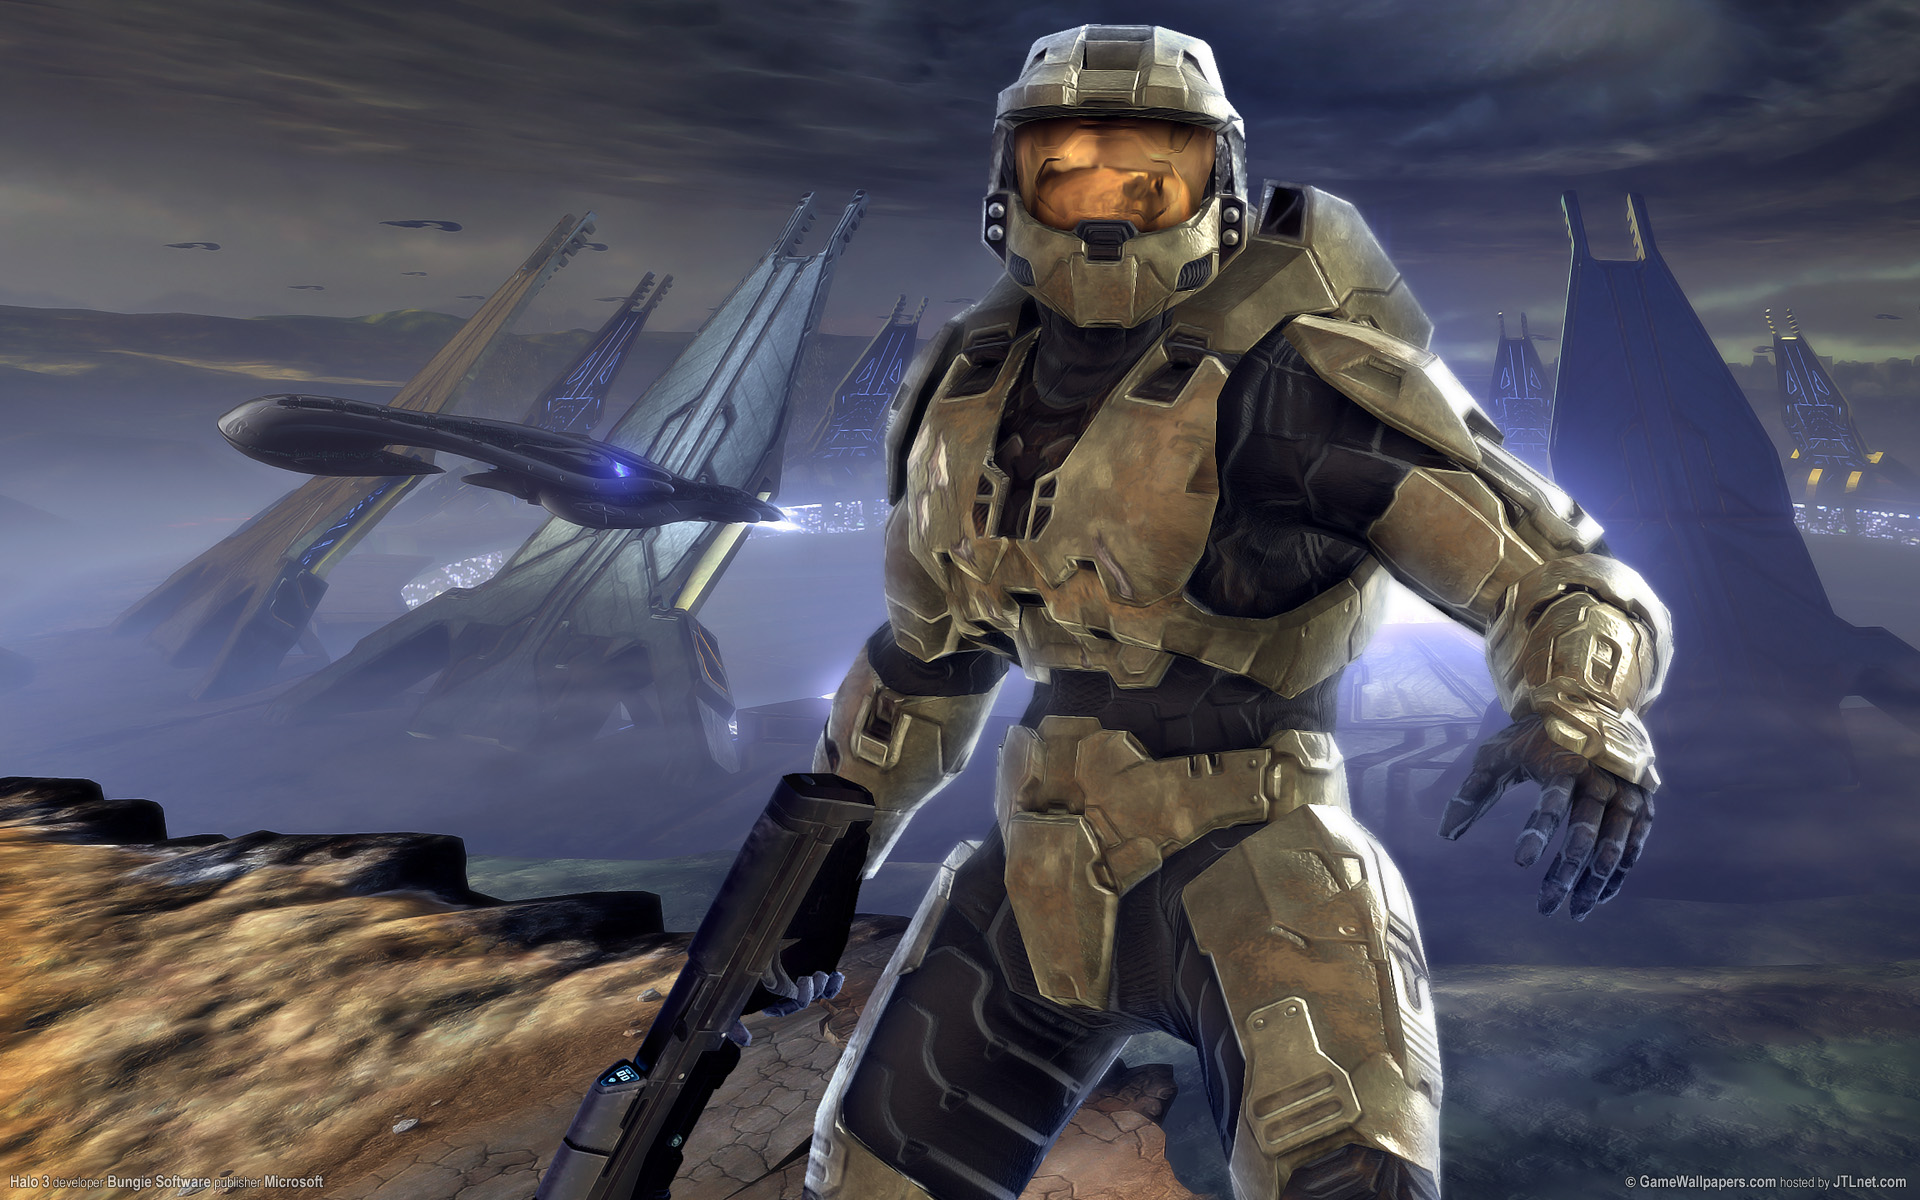 47 Halo 3 Desktop Backgrounds On Wallpapersafari